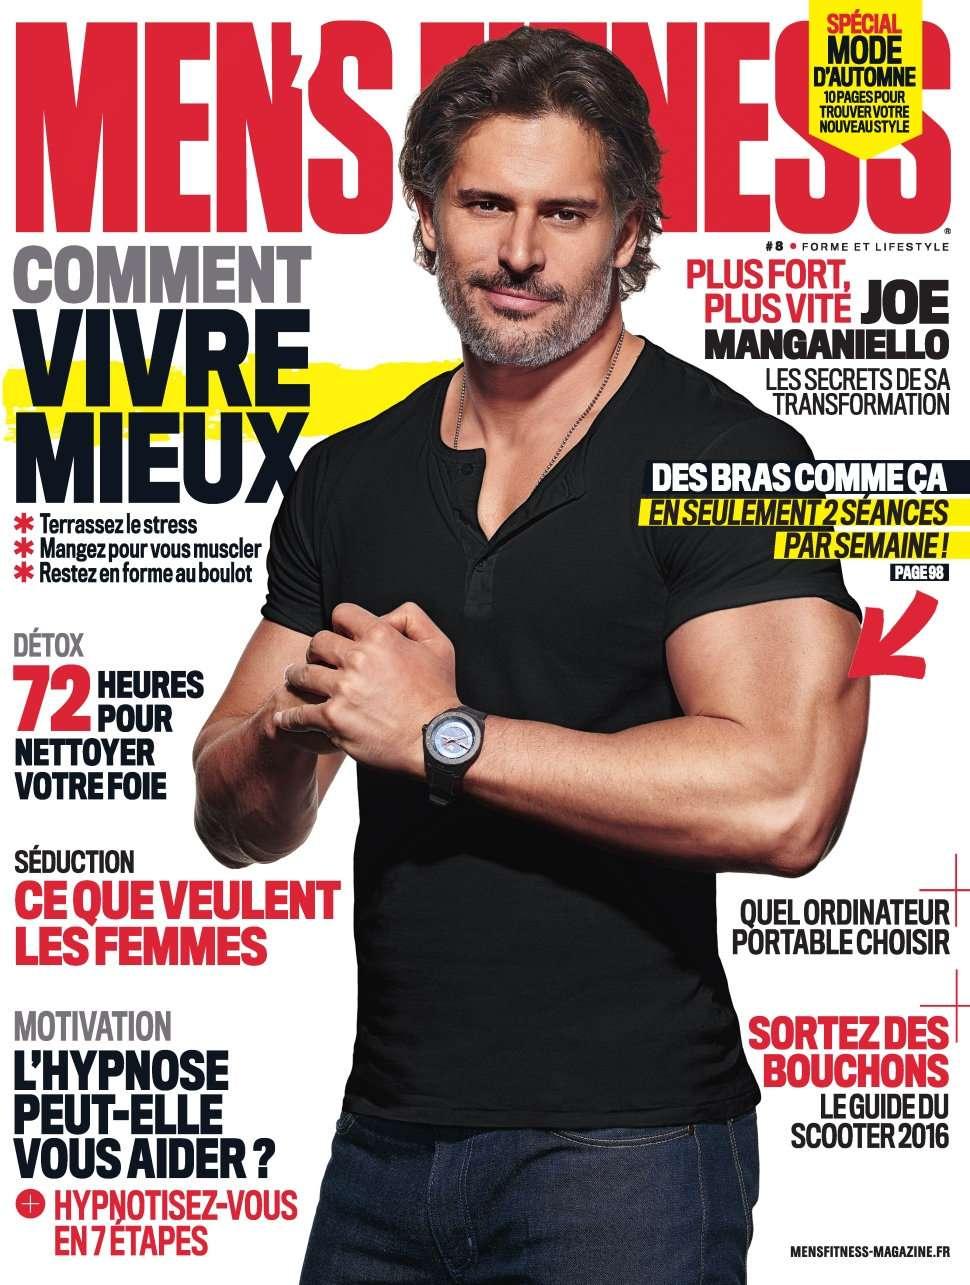 Men's Fitness 8 - Octobre 2016